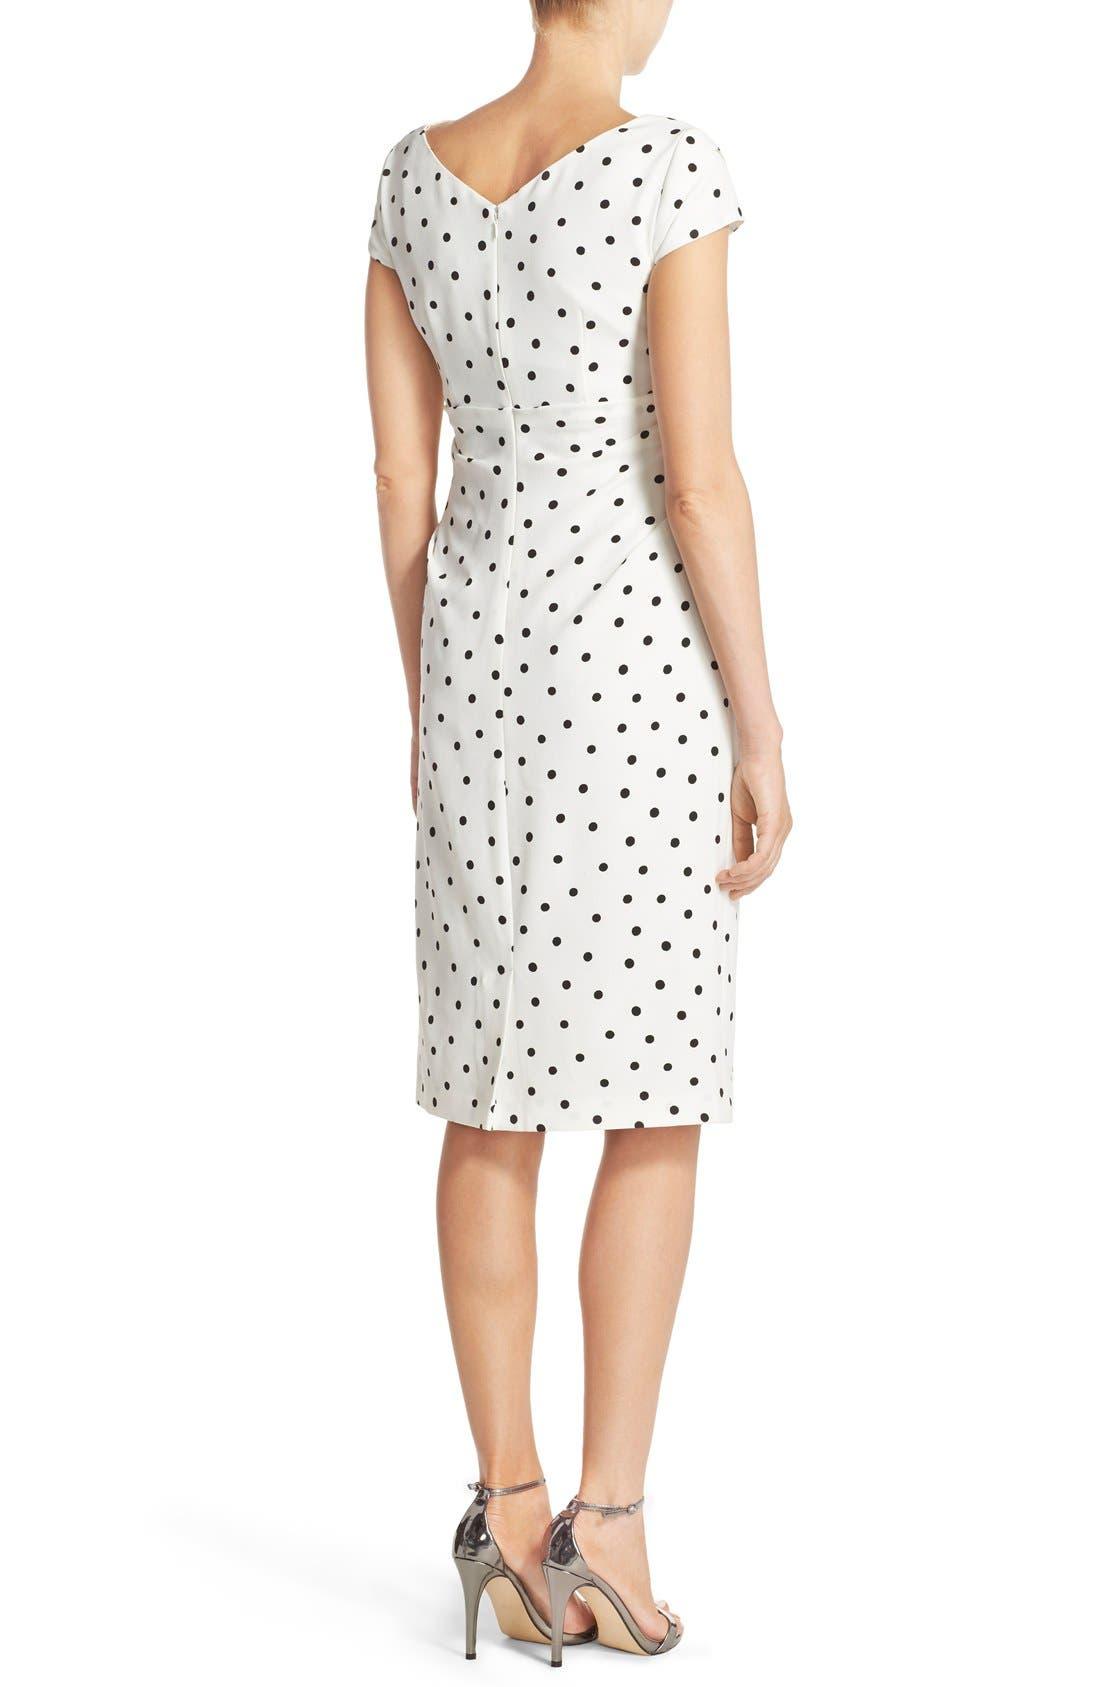 ADRIANNA PAPELL,                             Polka Dot Crepe Sheath Dress,                             Alternate thumbnail 3, color,                             900